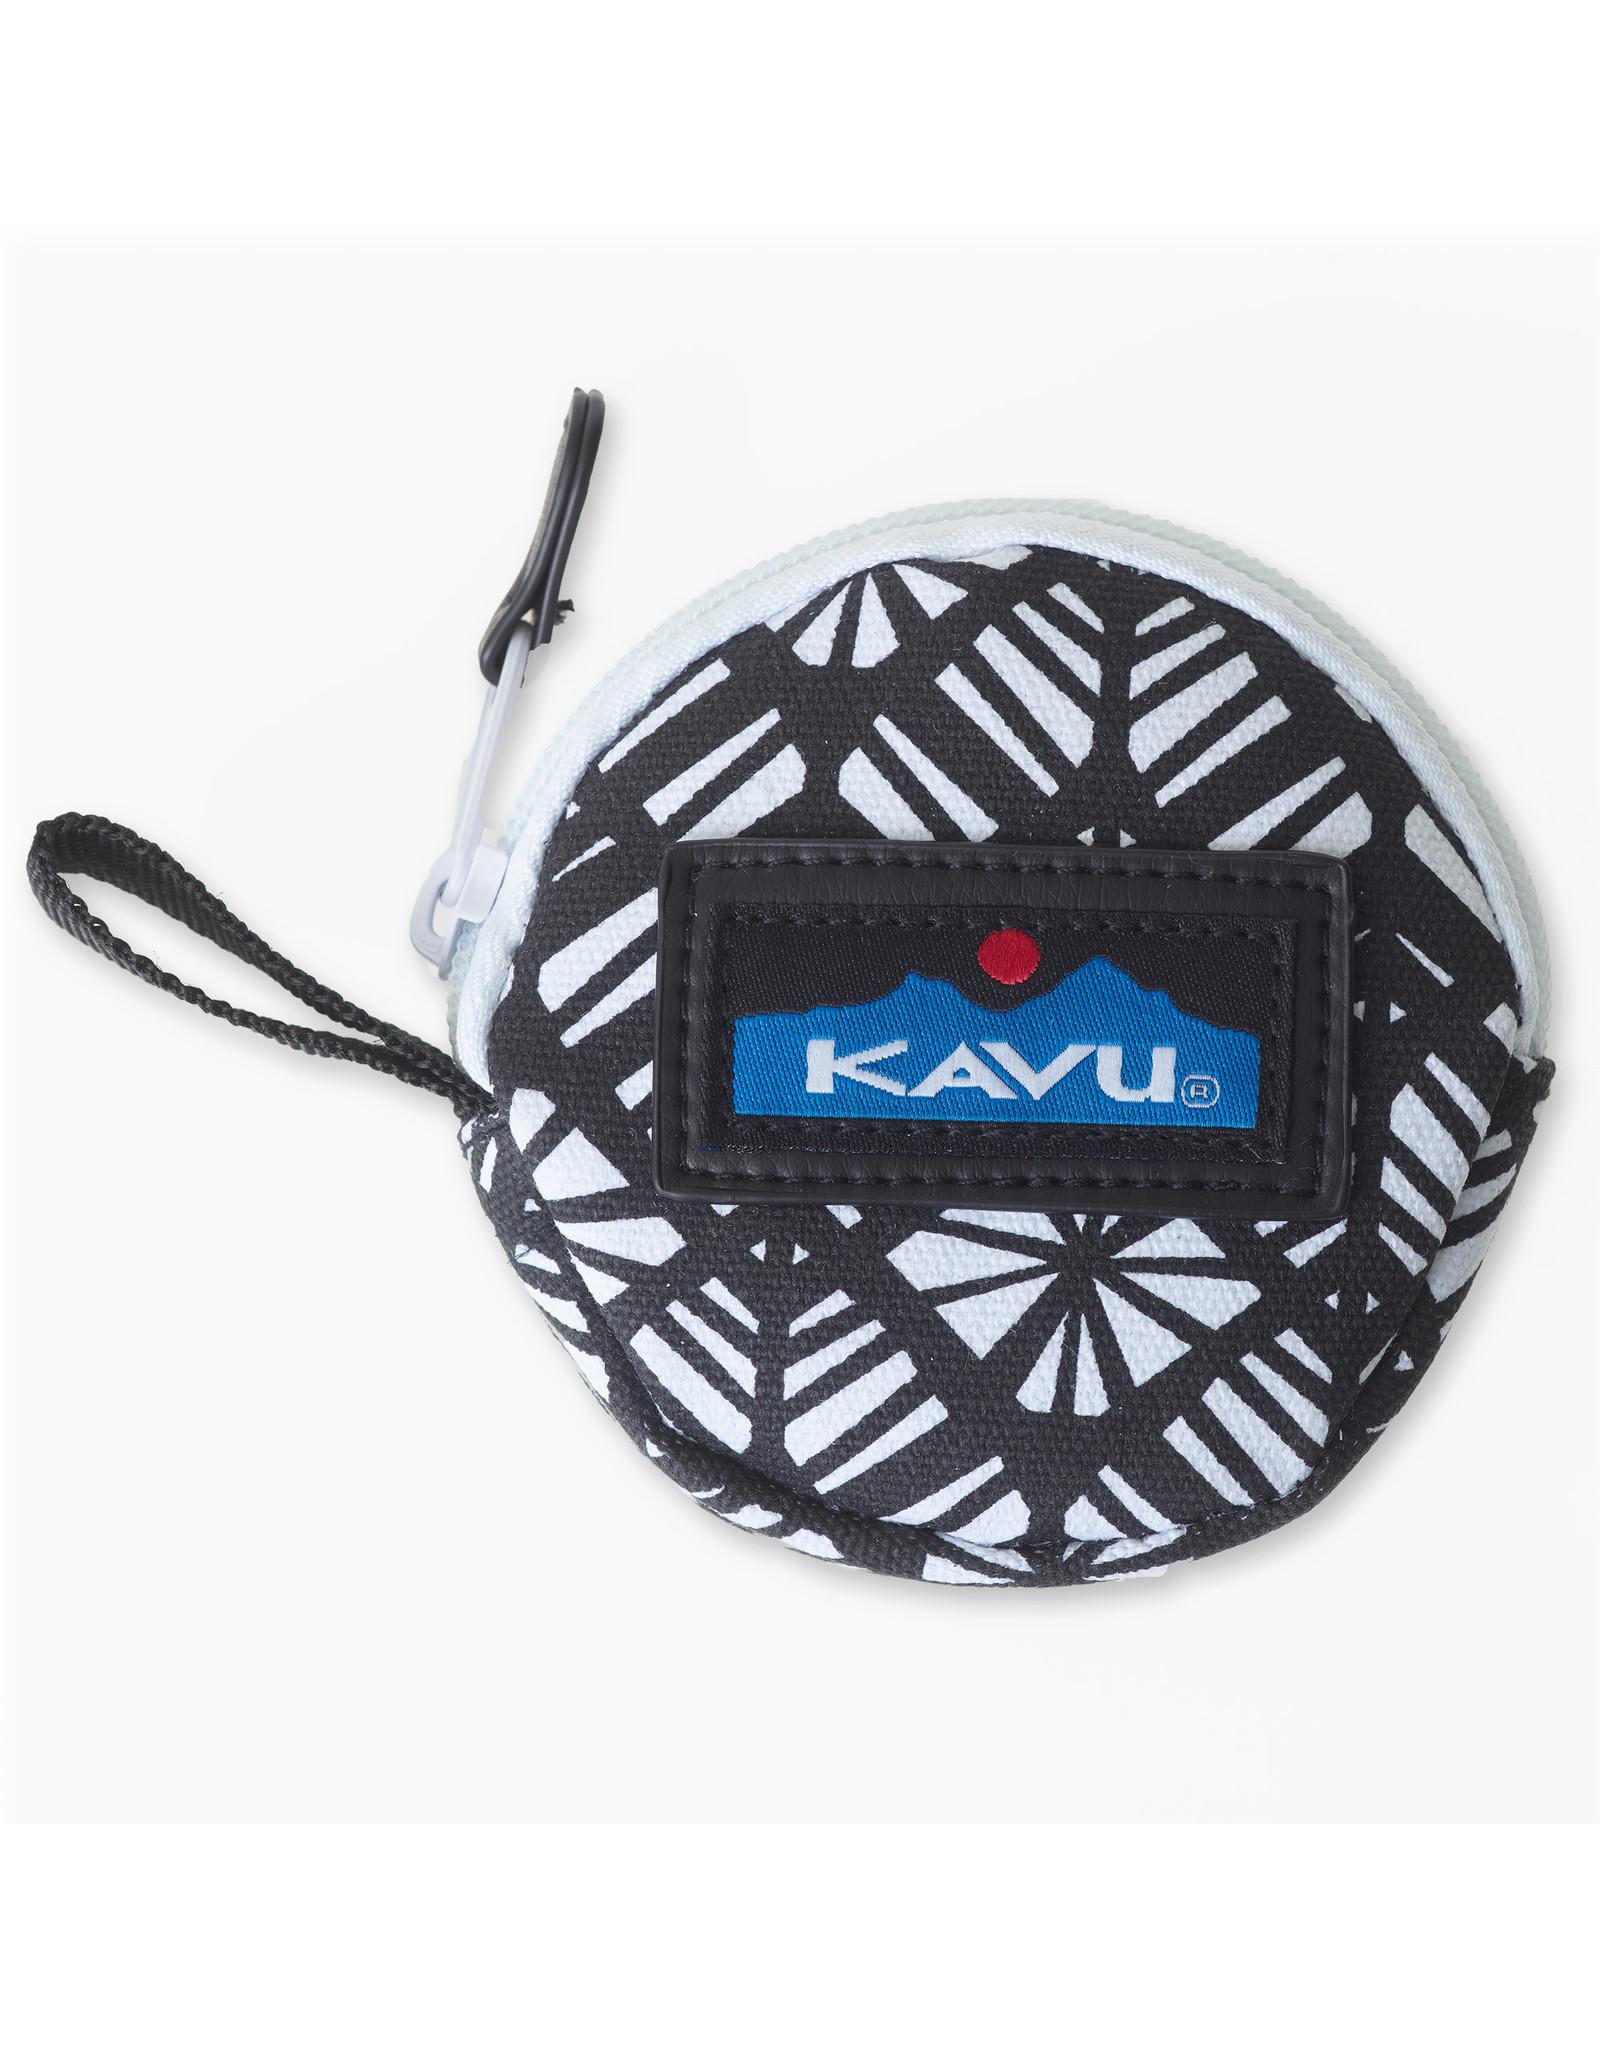 Kavu Coinkydink - Static Rhombus